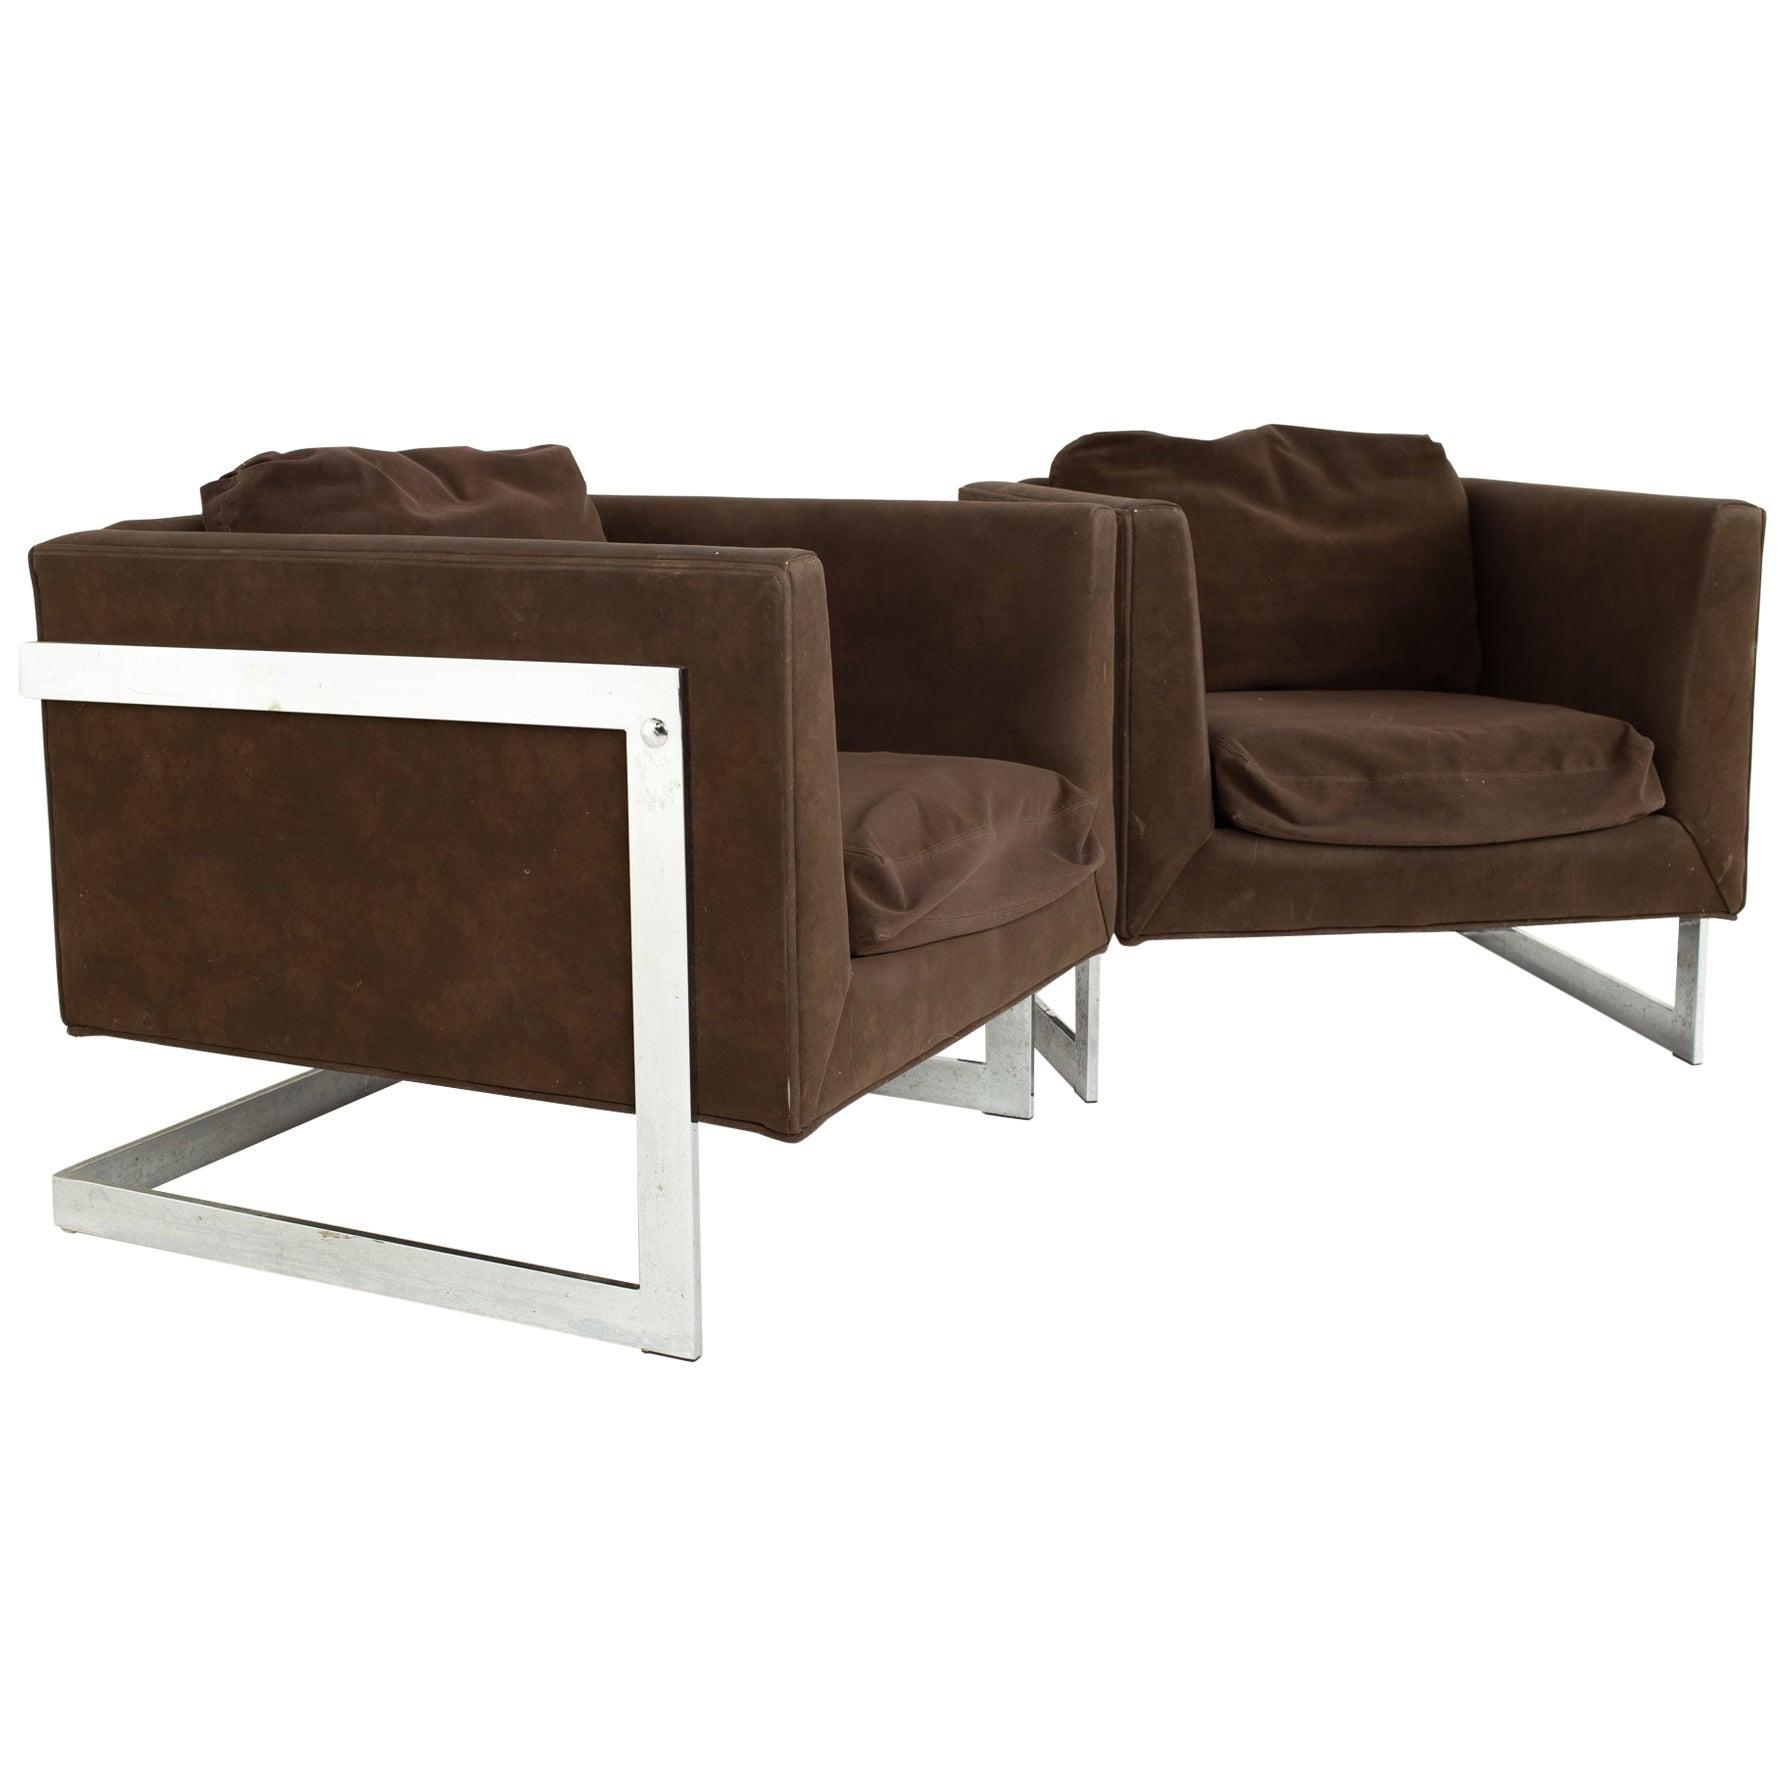 Milo Baughman Mid Century Chrome Cantilever Lounge Chairs - Pair